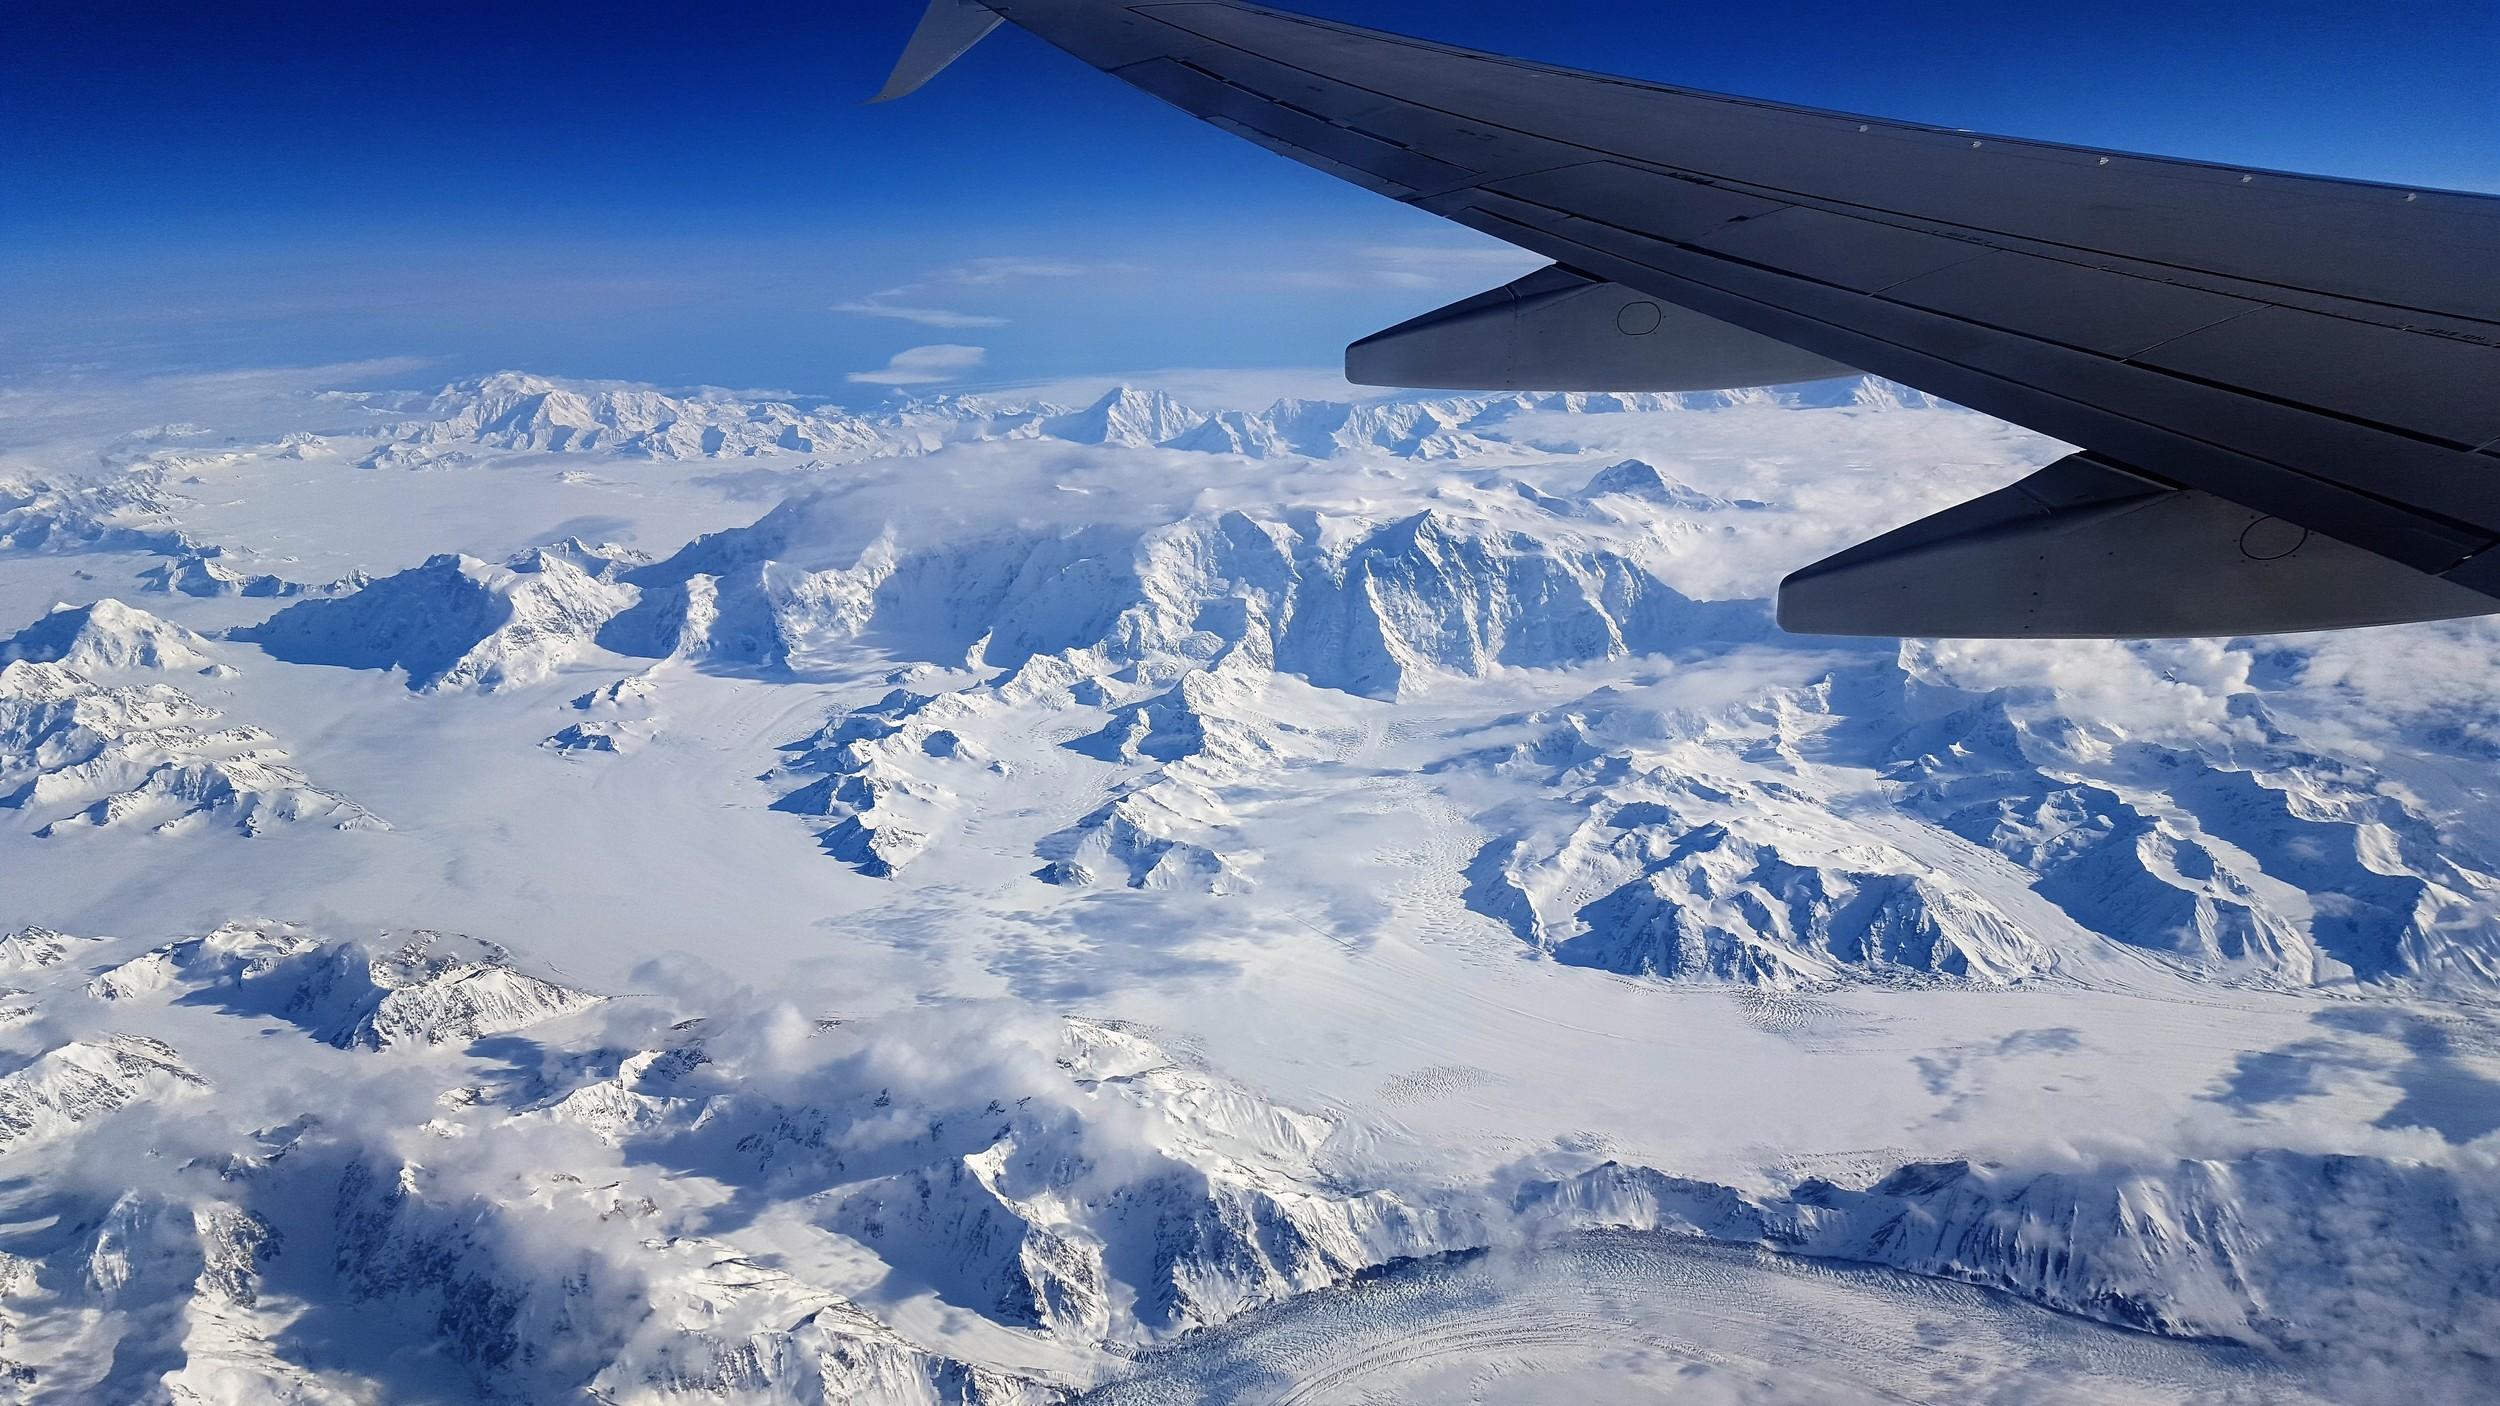 Mt. Logan:Highest peak in Canada situated in Yukon Territory, bordering Alaska and Canada